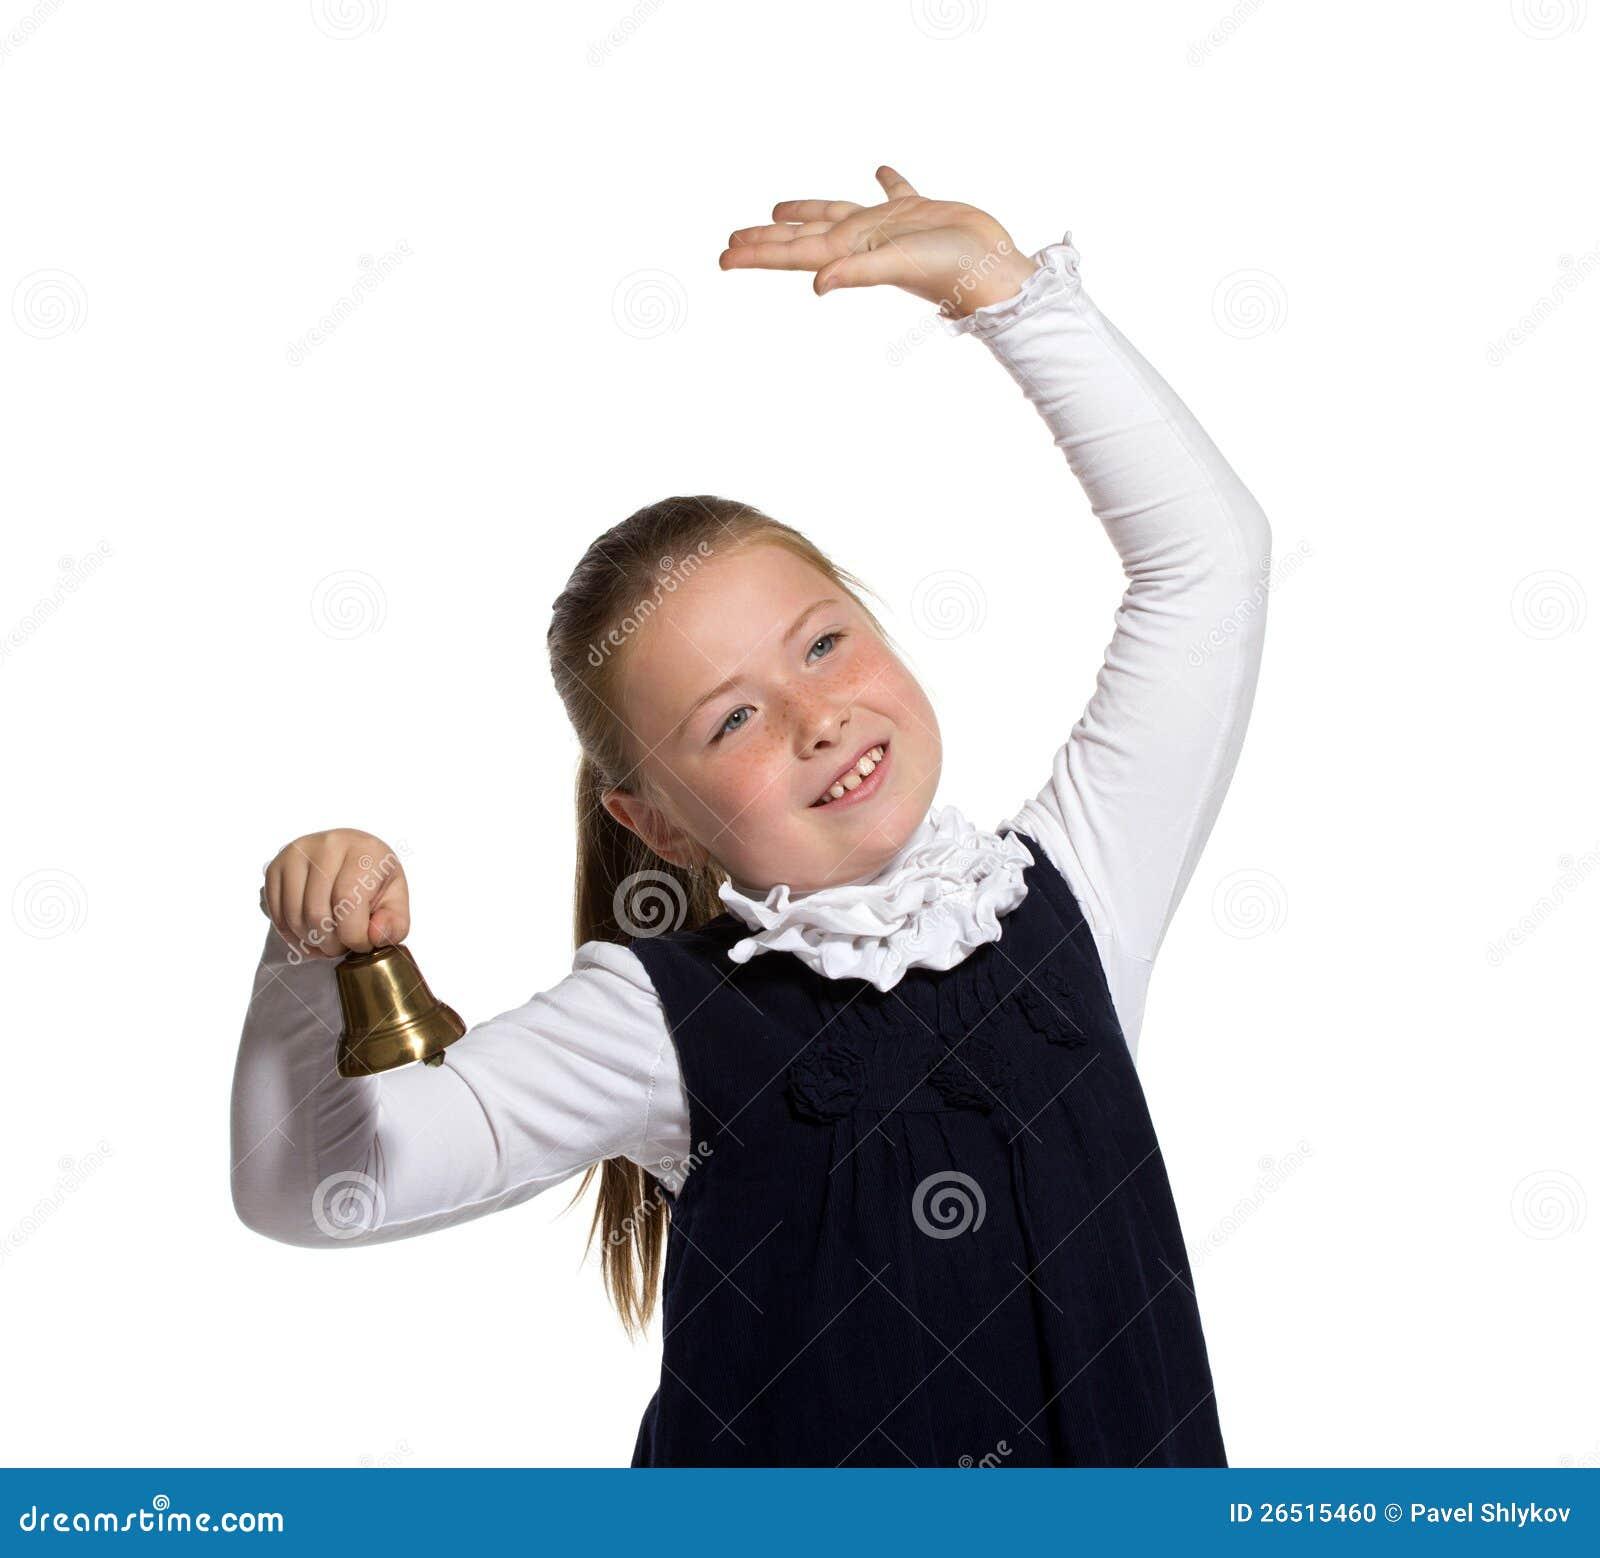 Menina da escola que soa um sino dourado